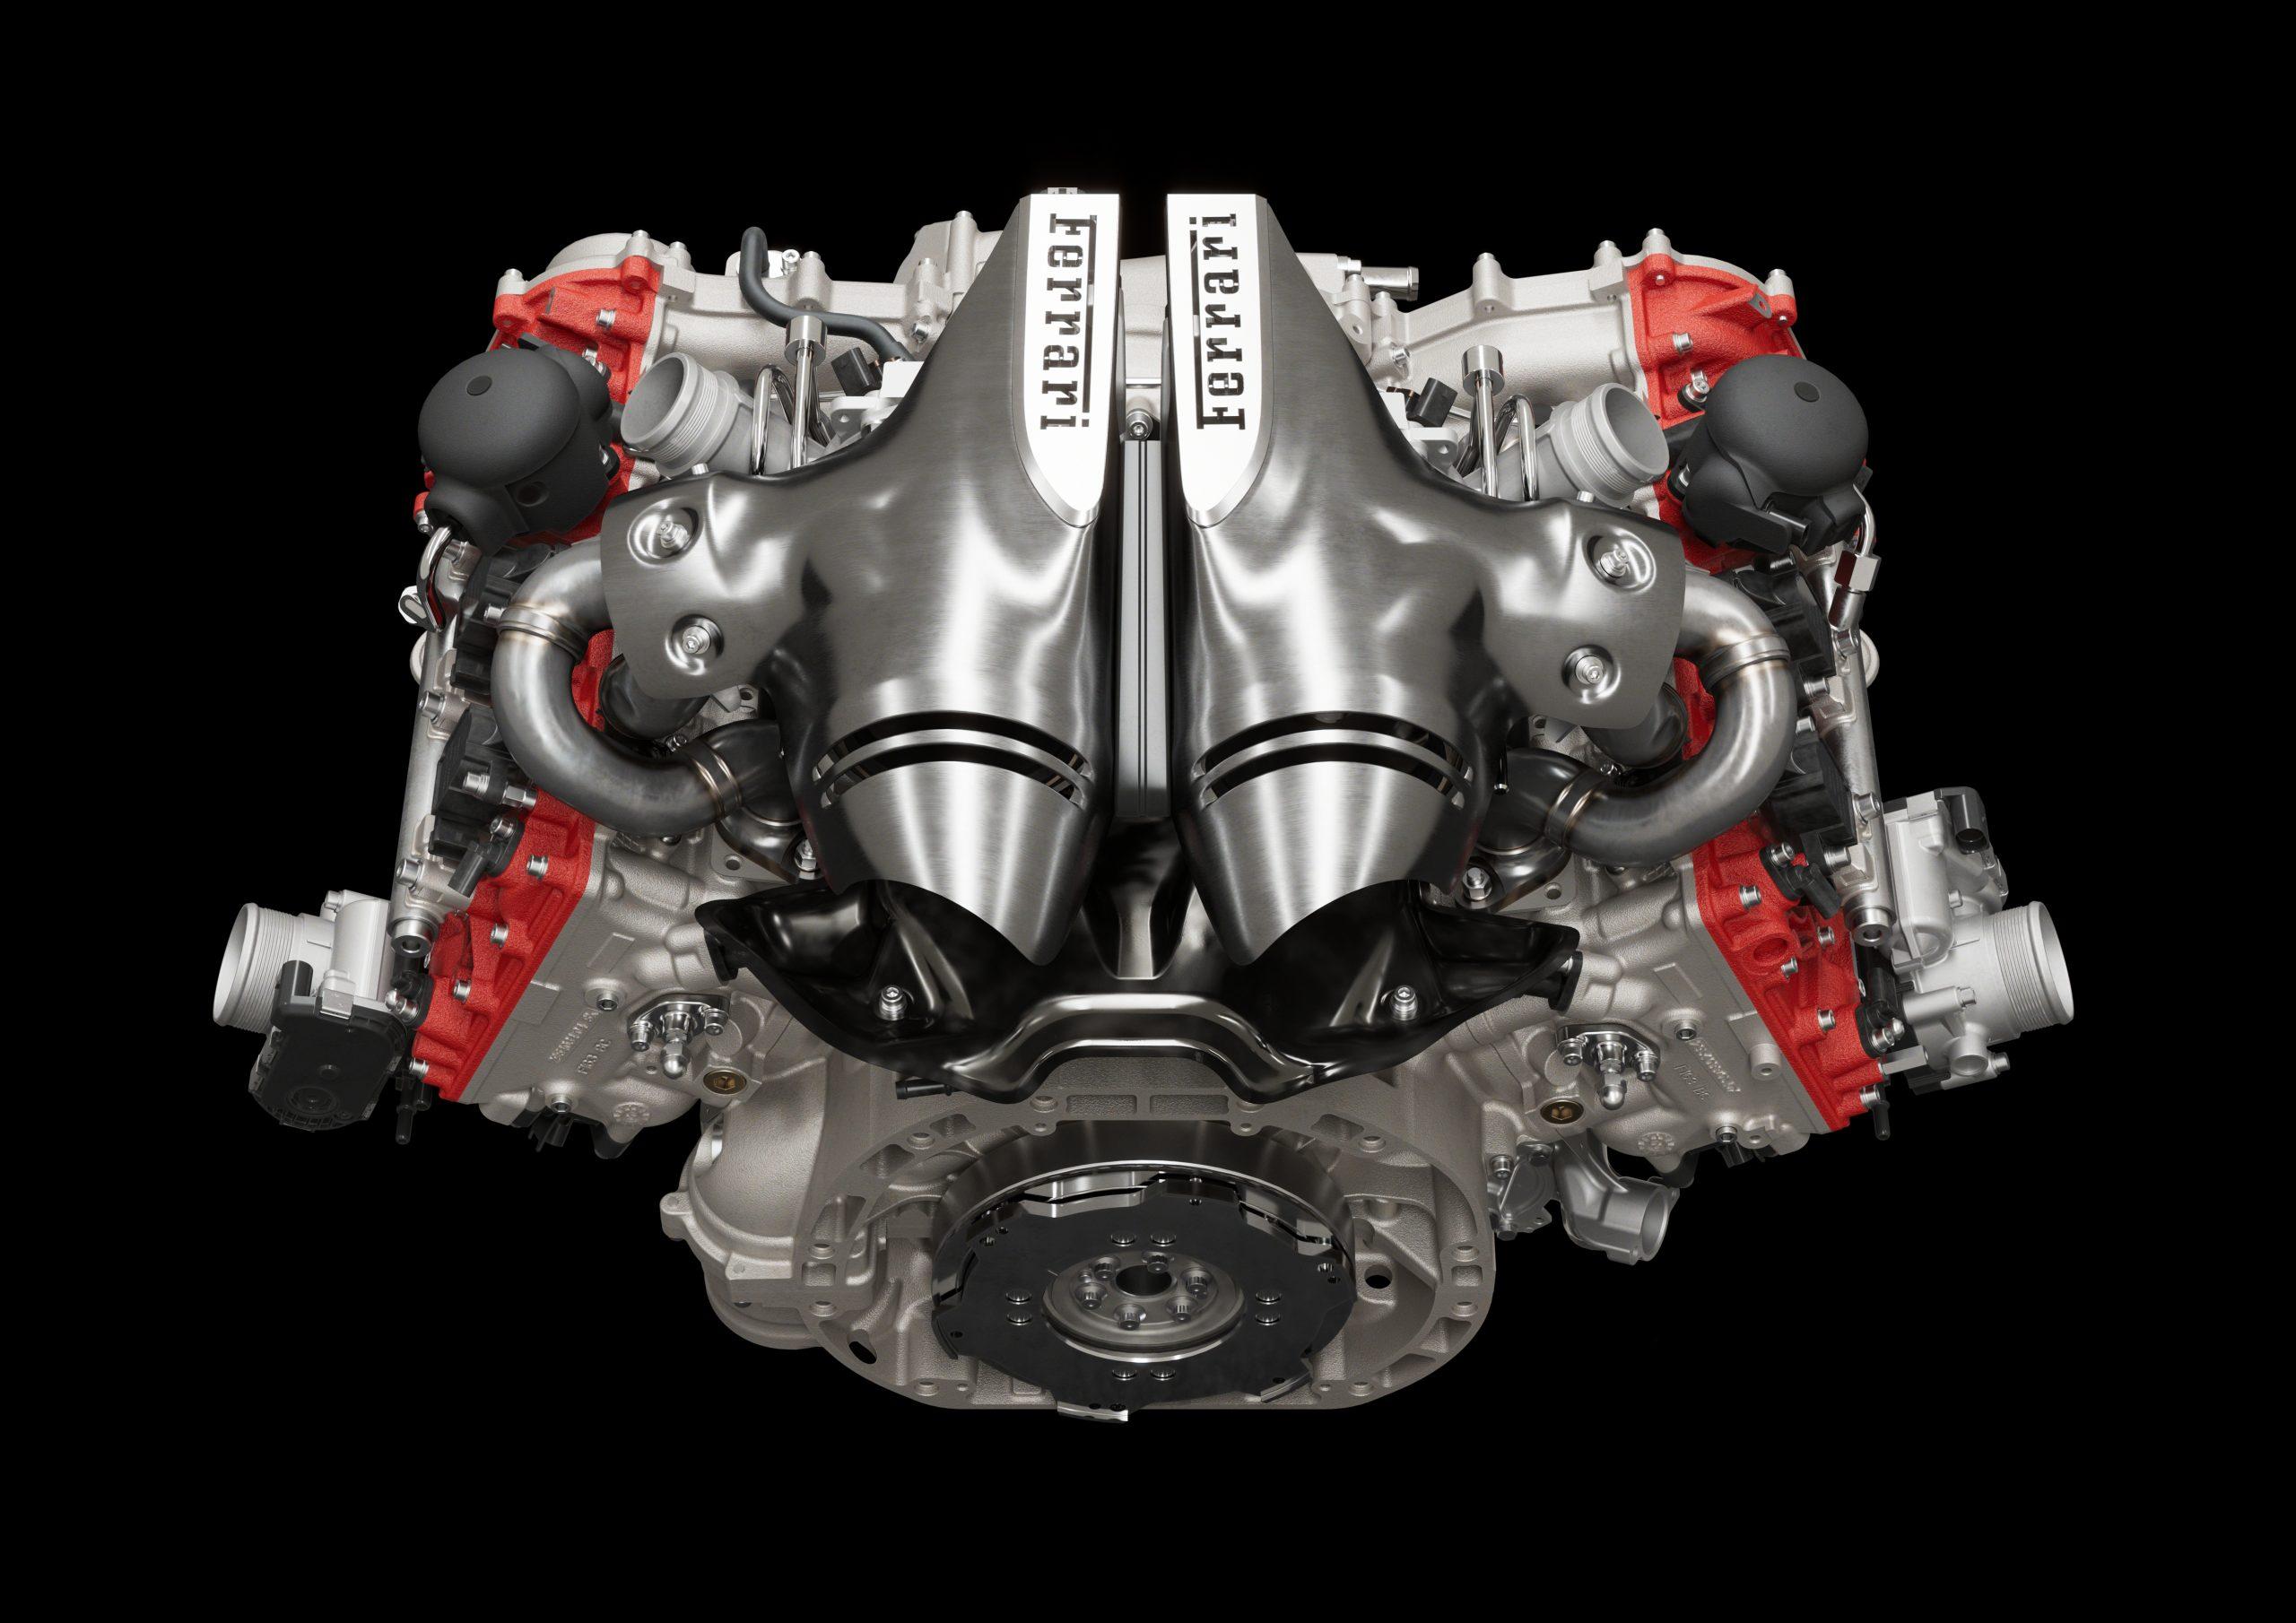 01 296 GTB Engine alto scaled Αυτή είναι η νέα Ferrari 296GTB 296GTB, Ferrari, Ferrari 296GTB, supercar, supercars, zblog, ειδήσεις, Νέα